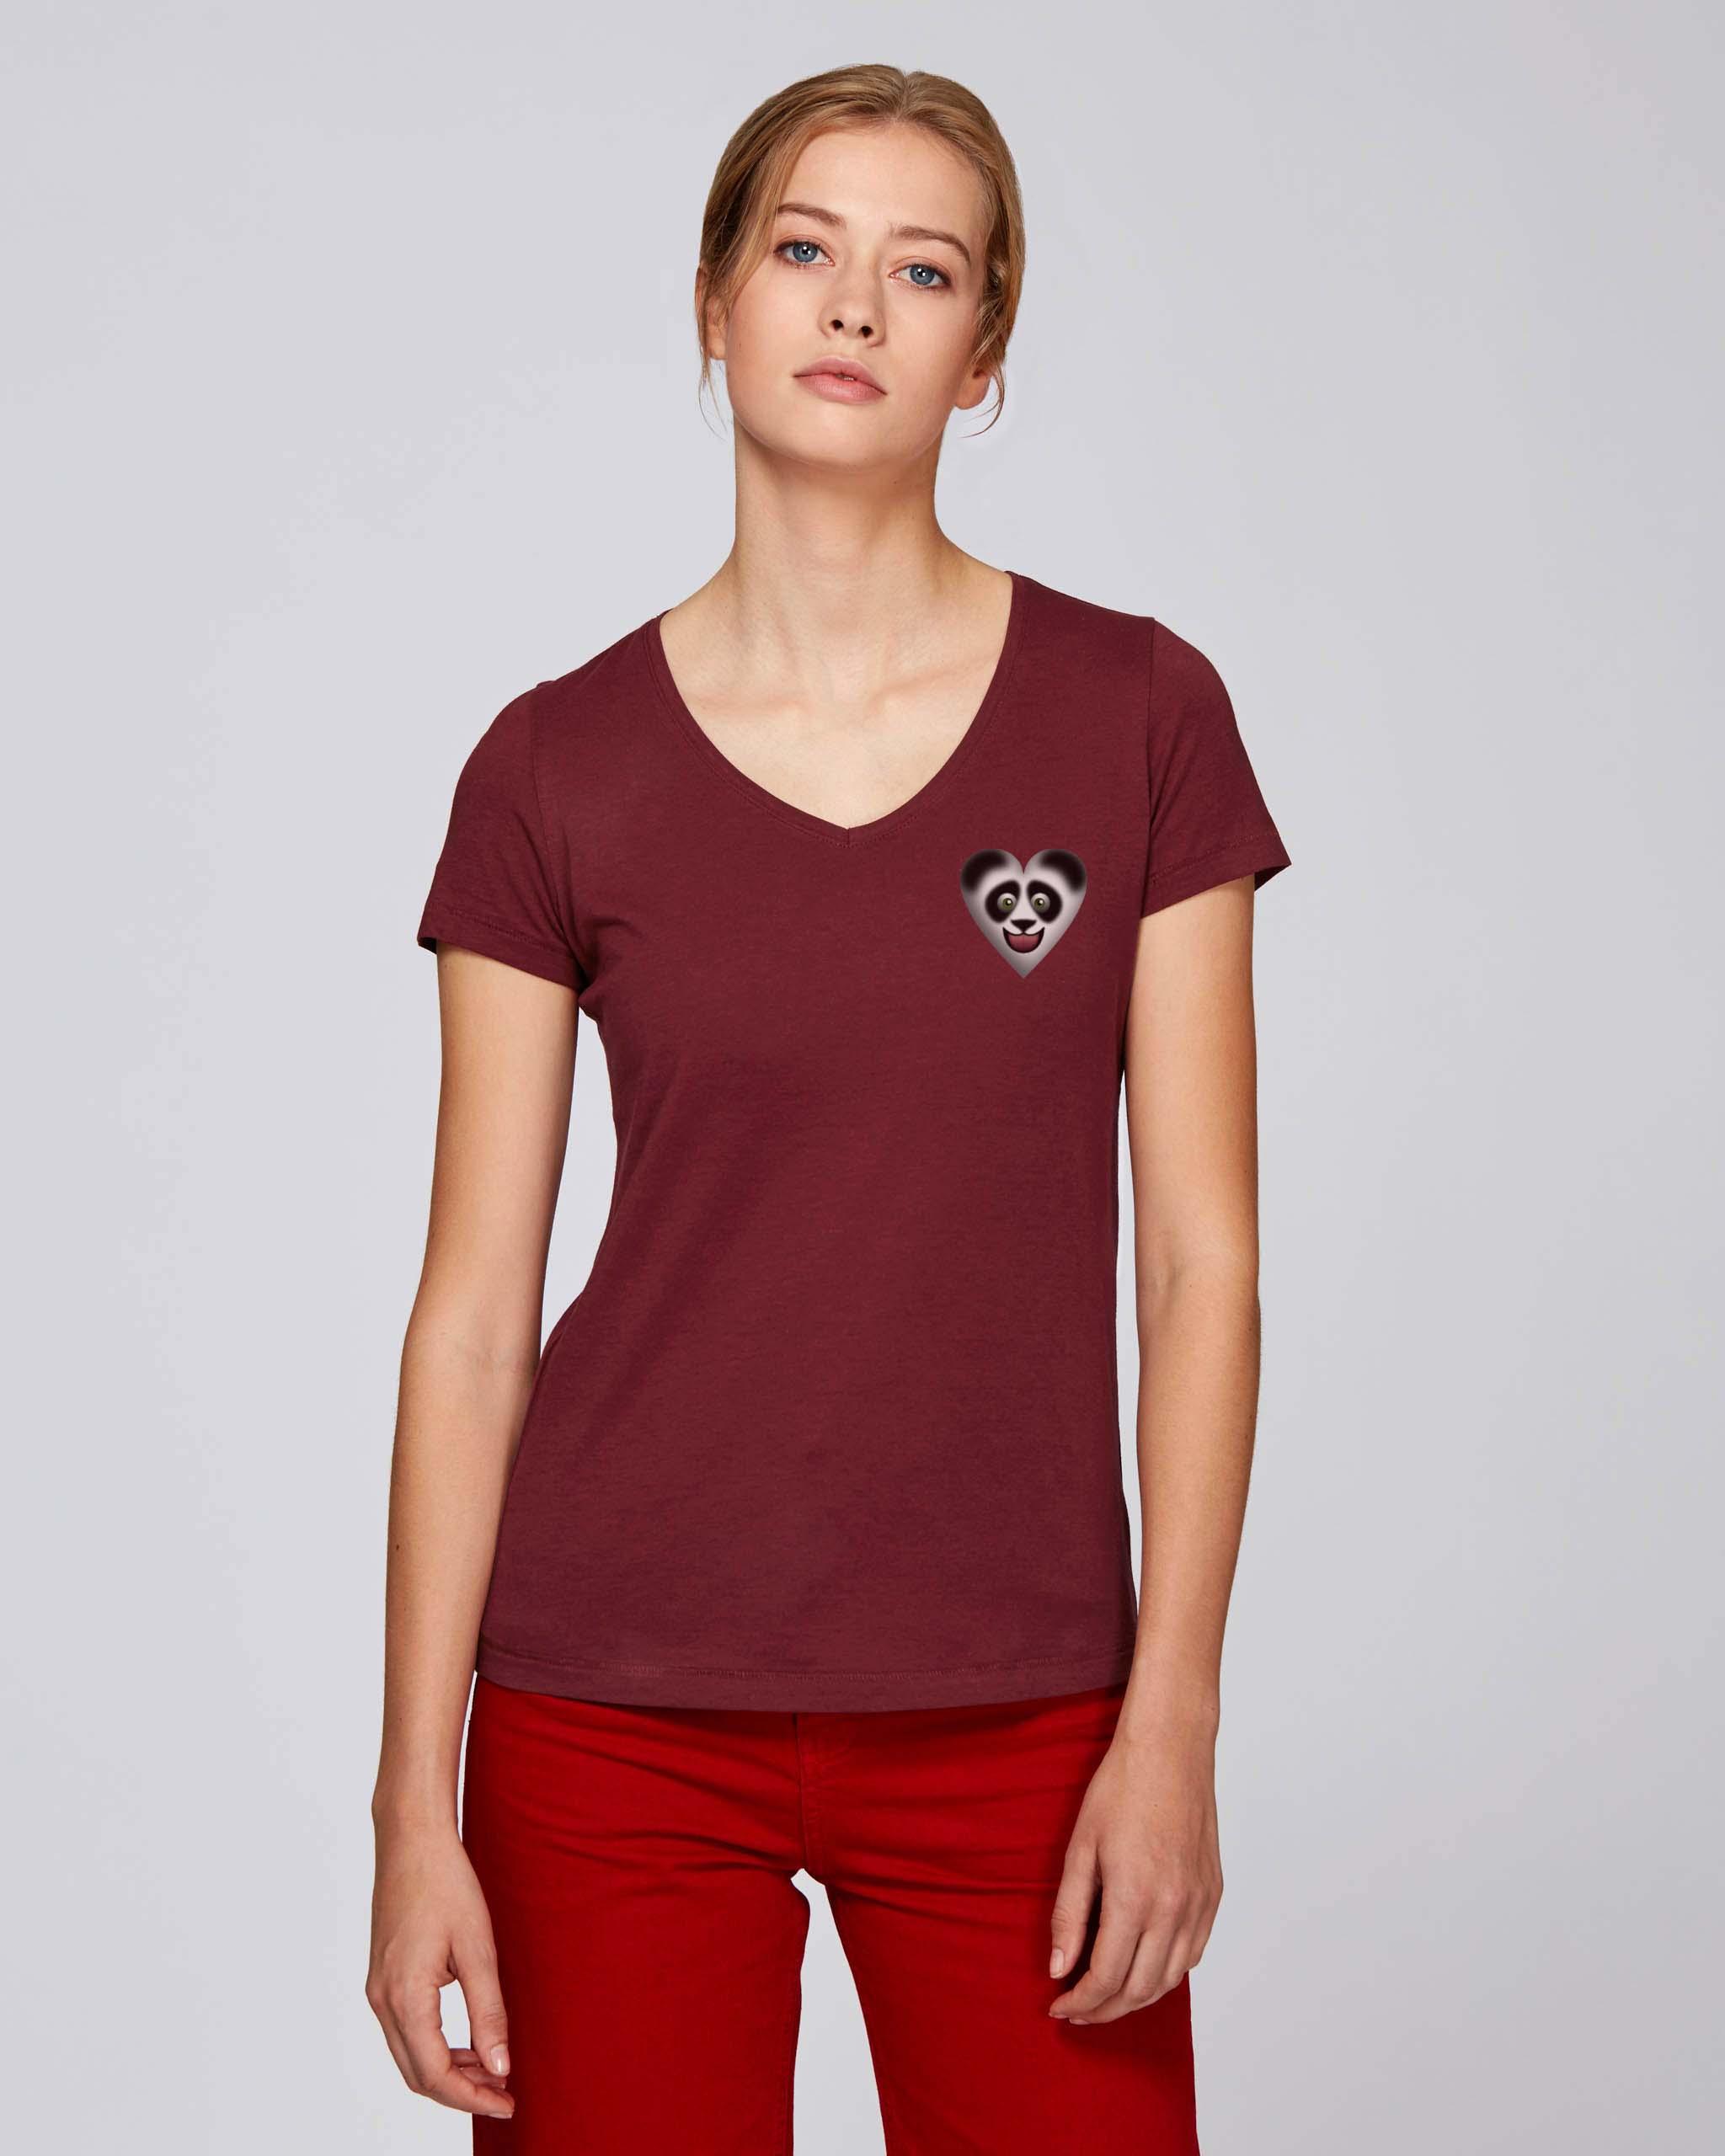 T-Shirt Bio bordeaux Femme – Panda tee